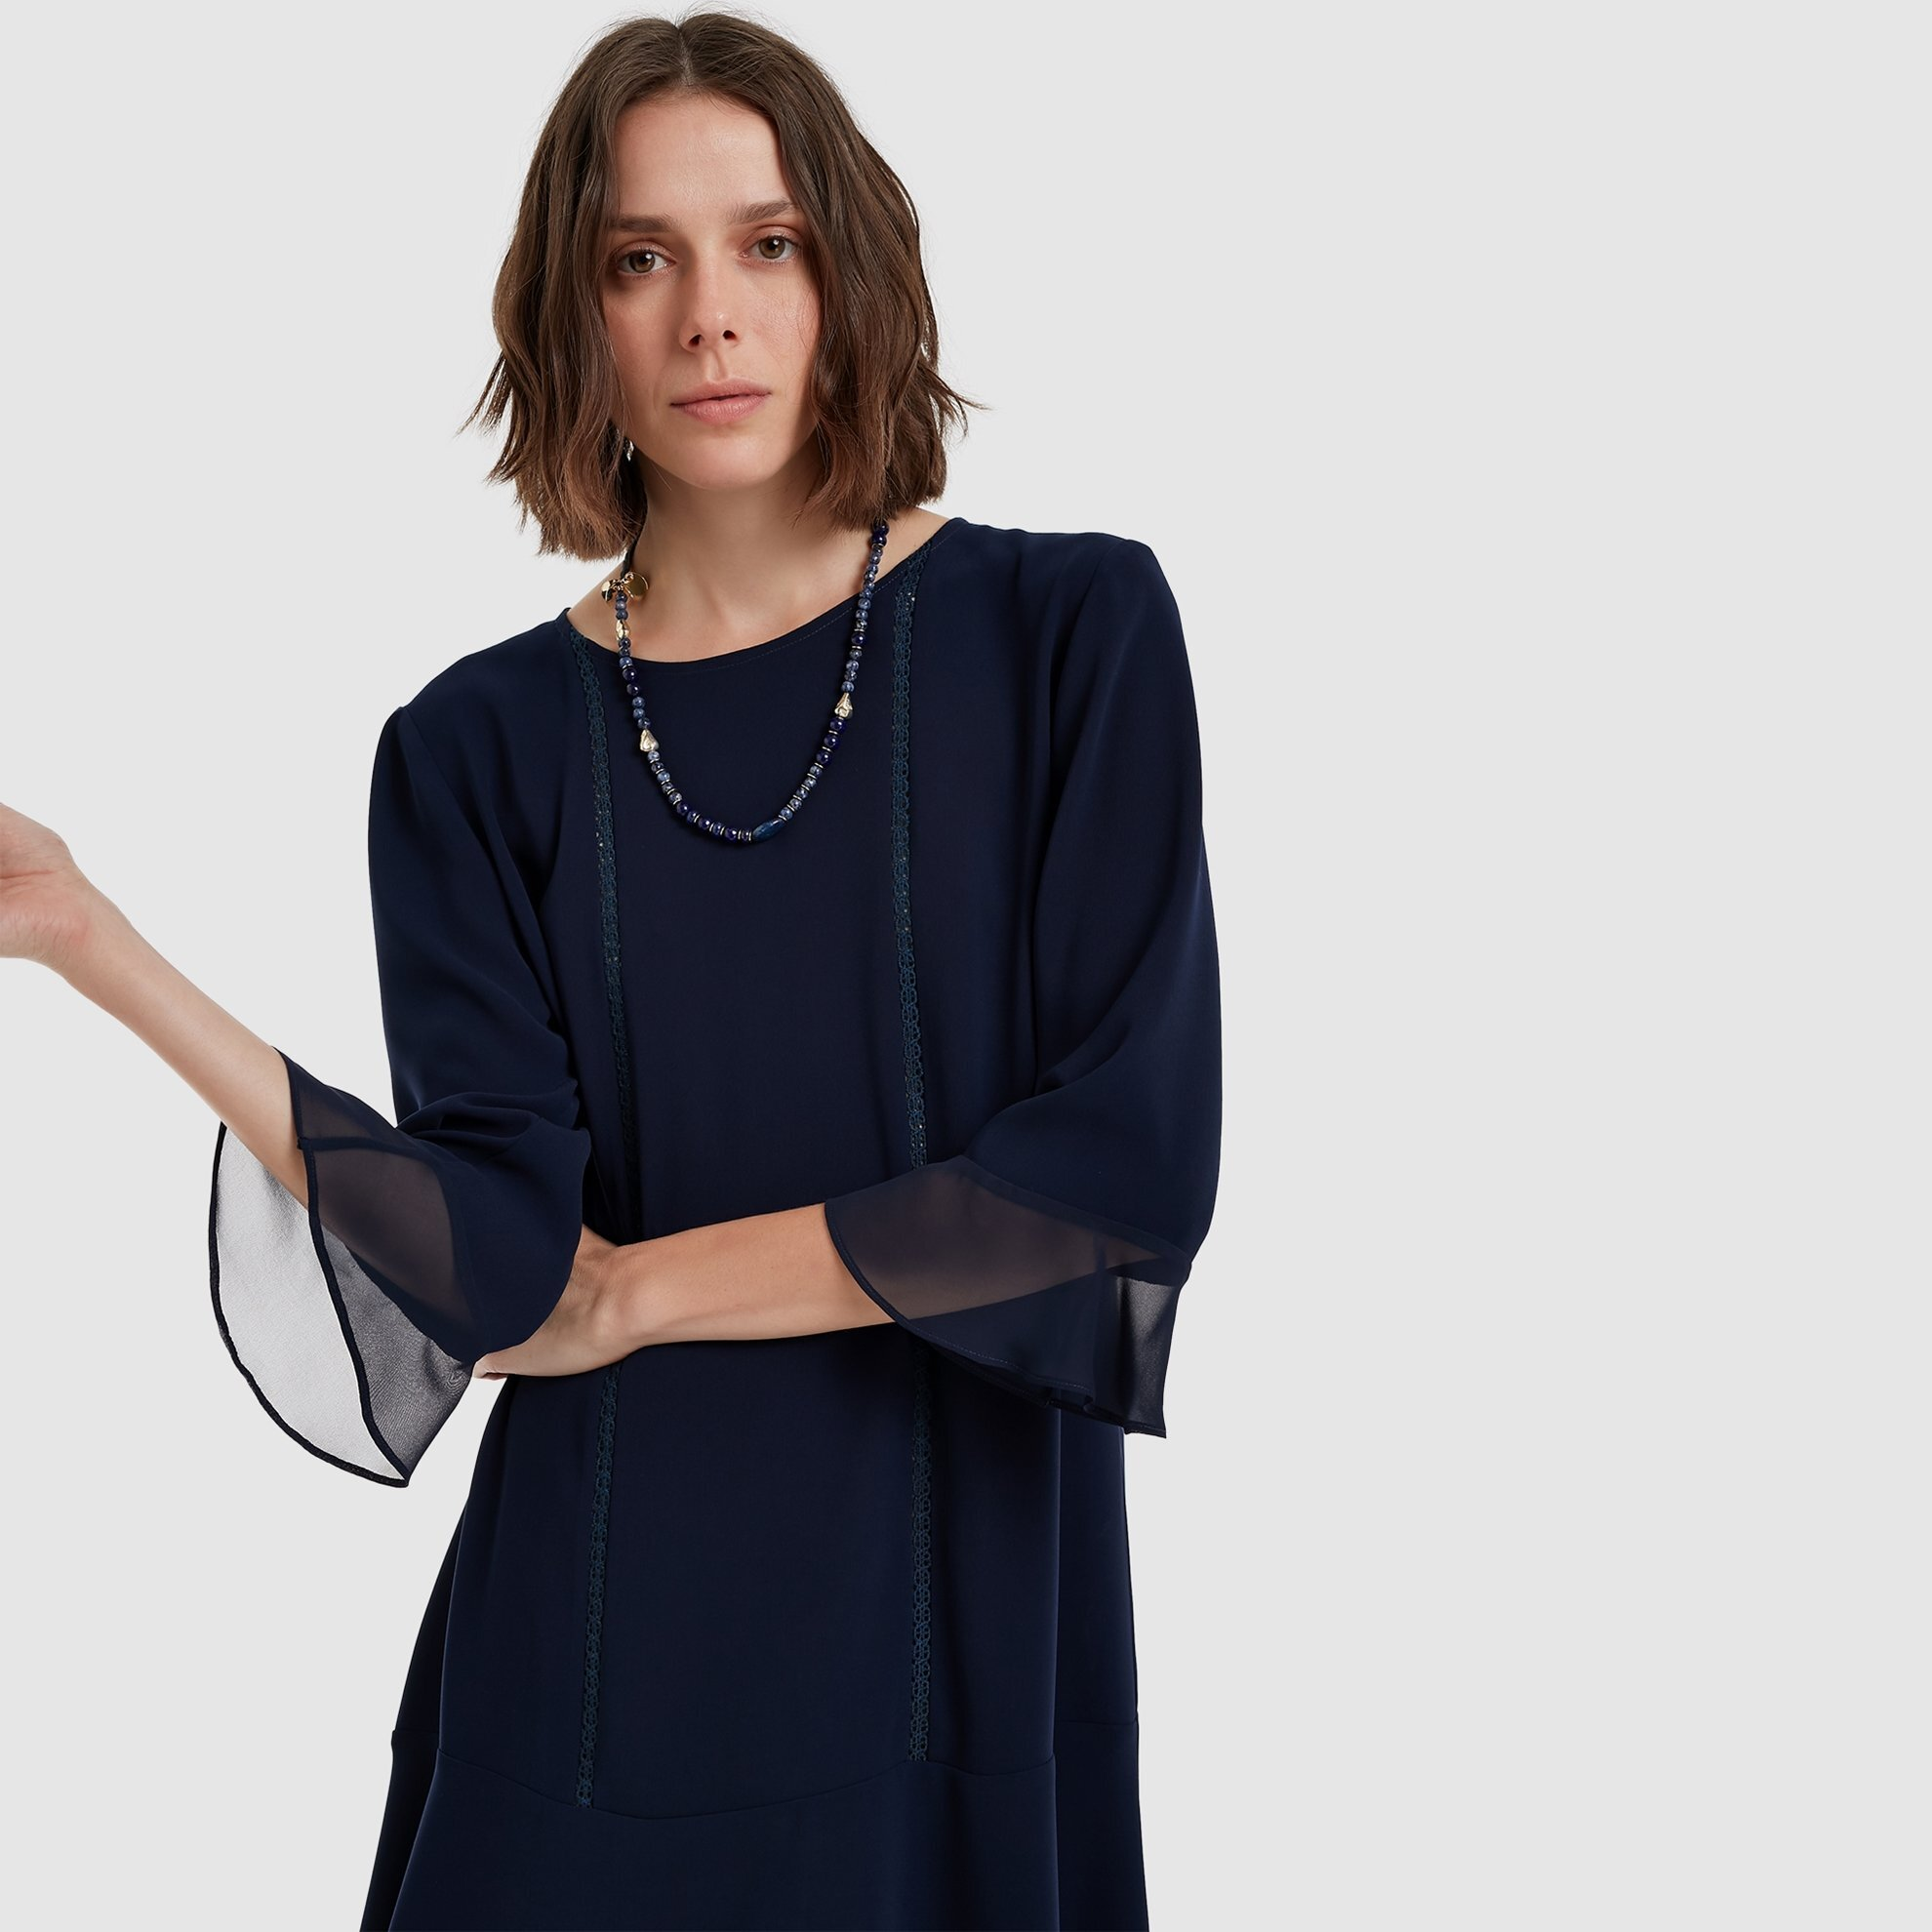 Volan Detaylı Elbise